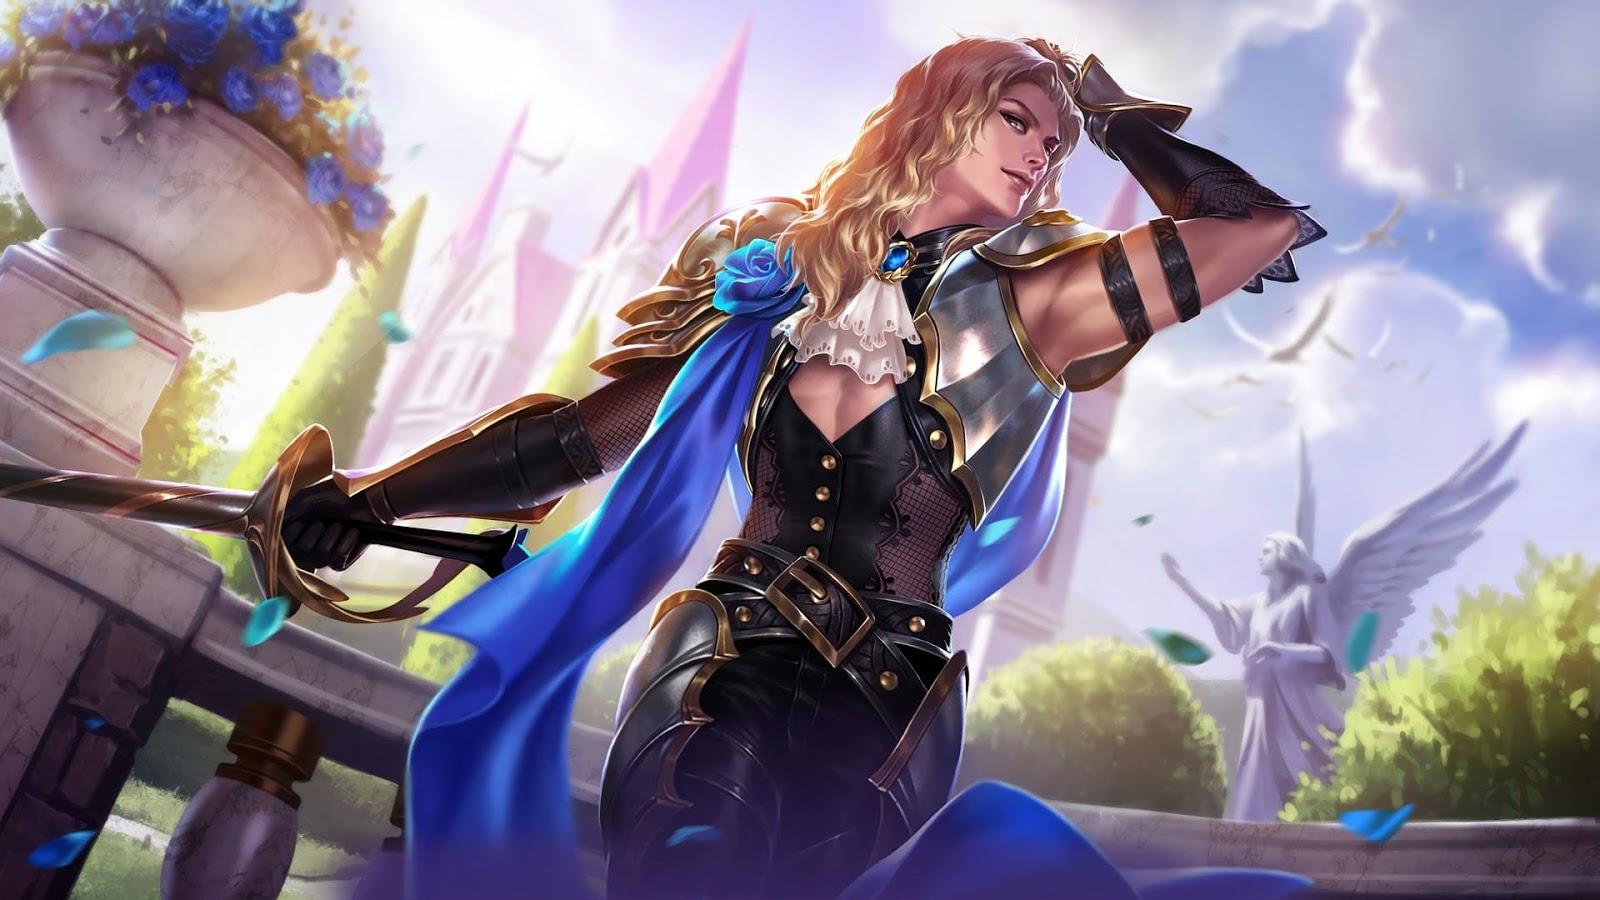 Wallpaper Lancelot Perfumed Knight Skin Mobile Legends HD for PC